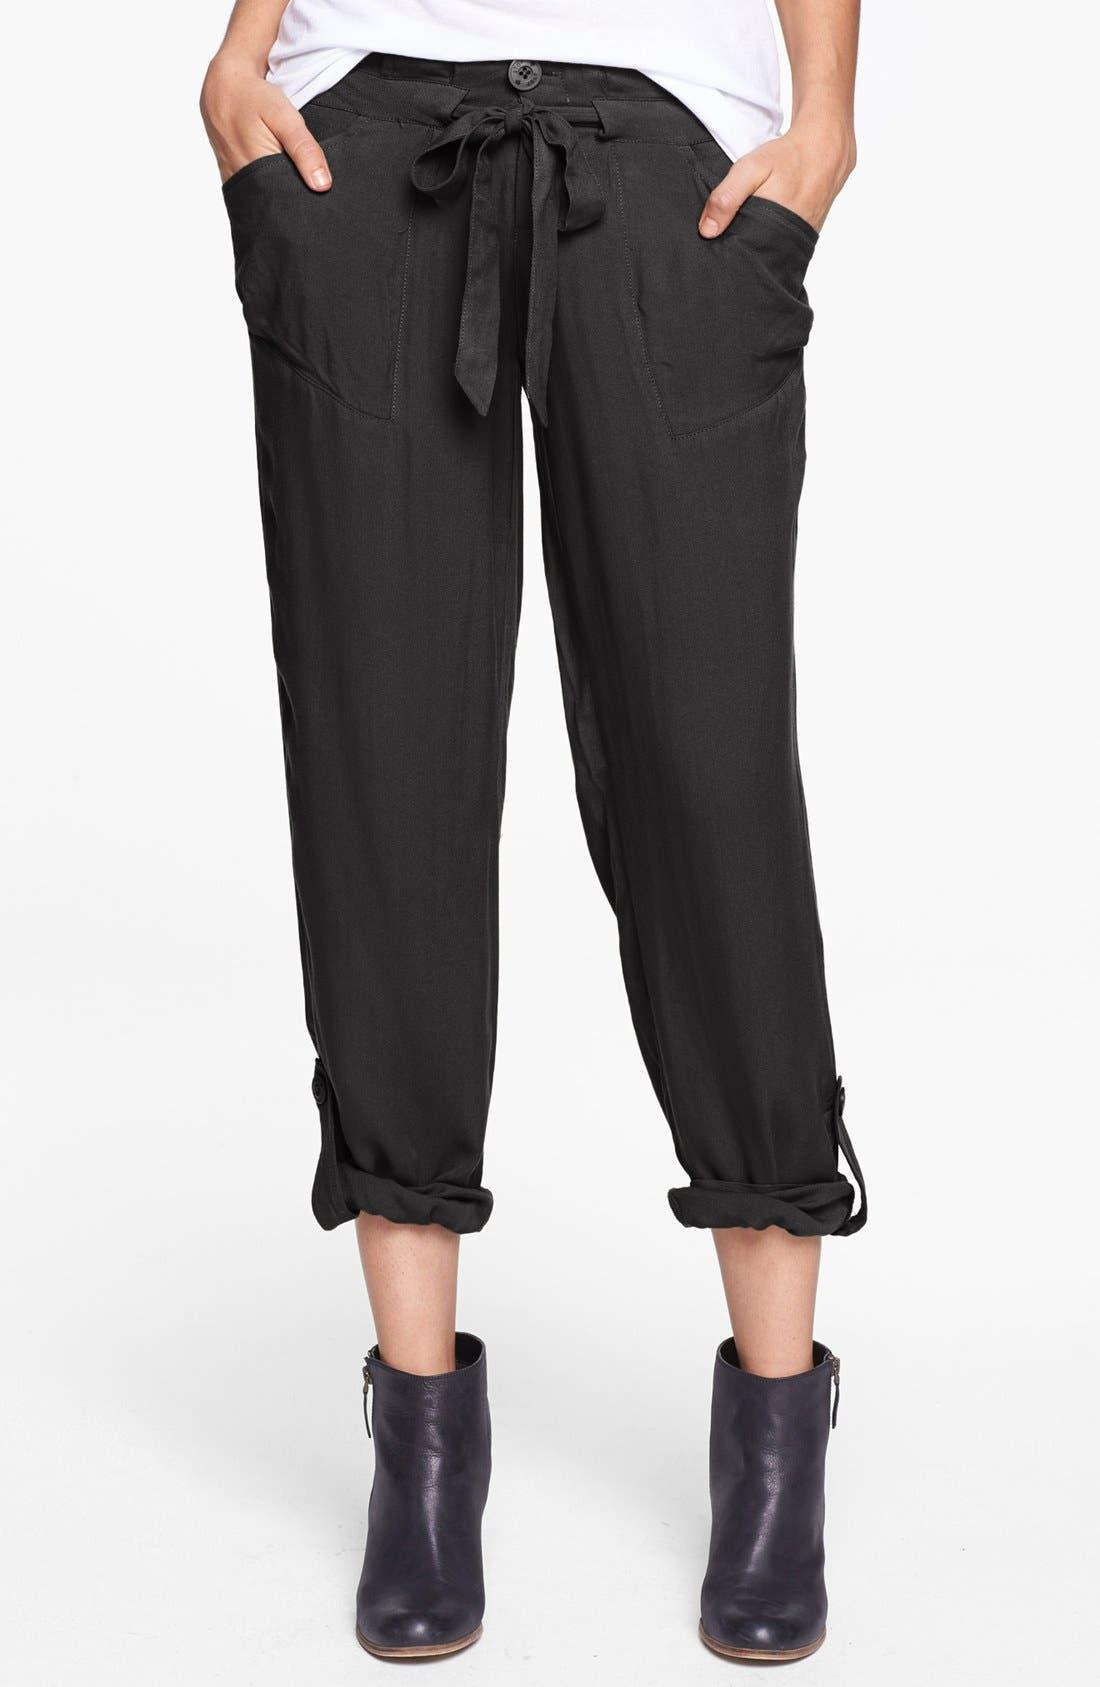 JOLT, Drawstring Woven Pants, Main thumbnail 1, color, 001